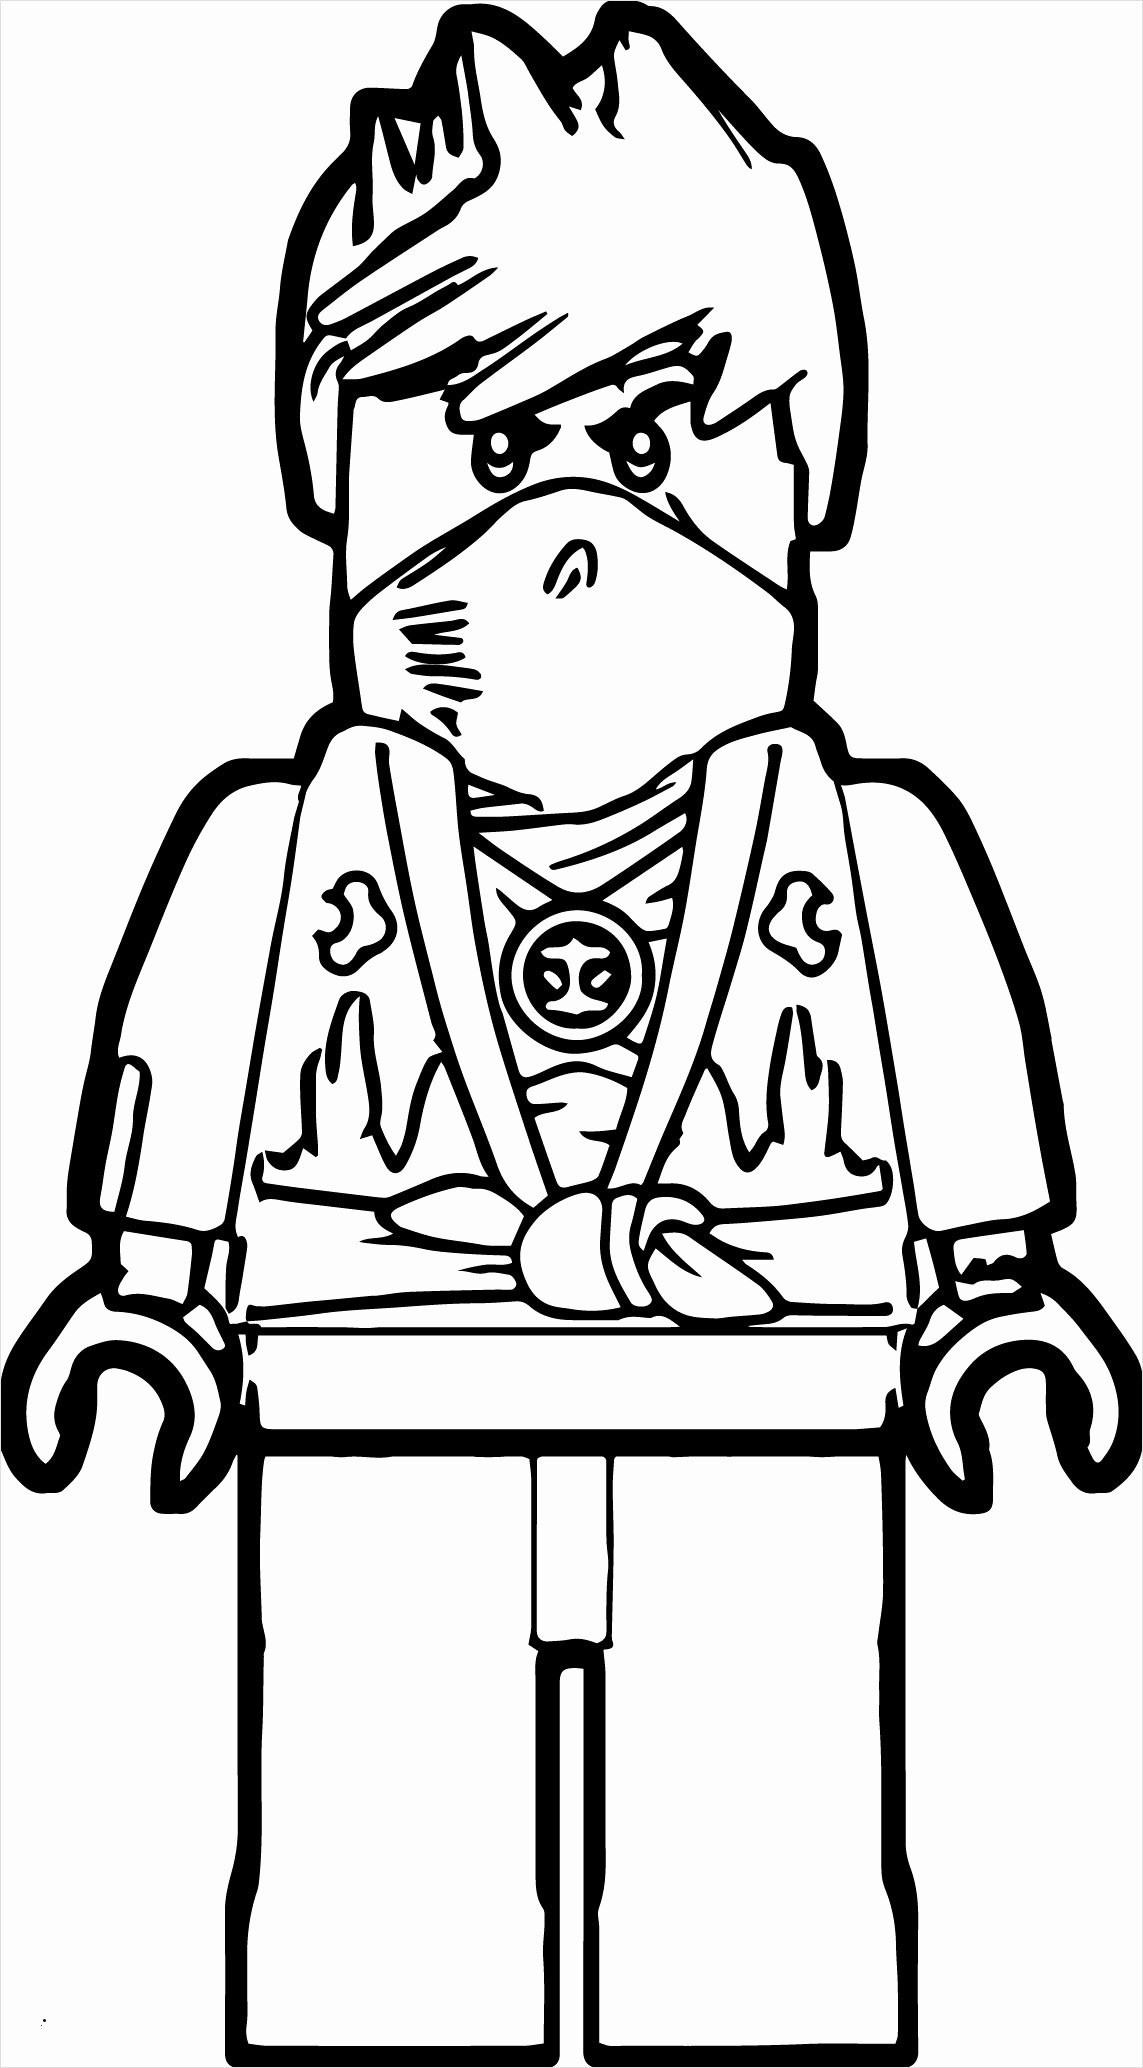 Ninjago Ausmalbilder Lord Garmadon Frisch Ausmalbilder Lego Ninjago Elegant Lego Ninjago Lord Garmadon Genial Das Bild